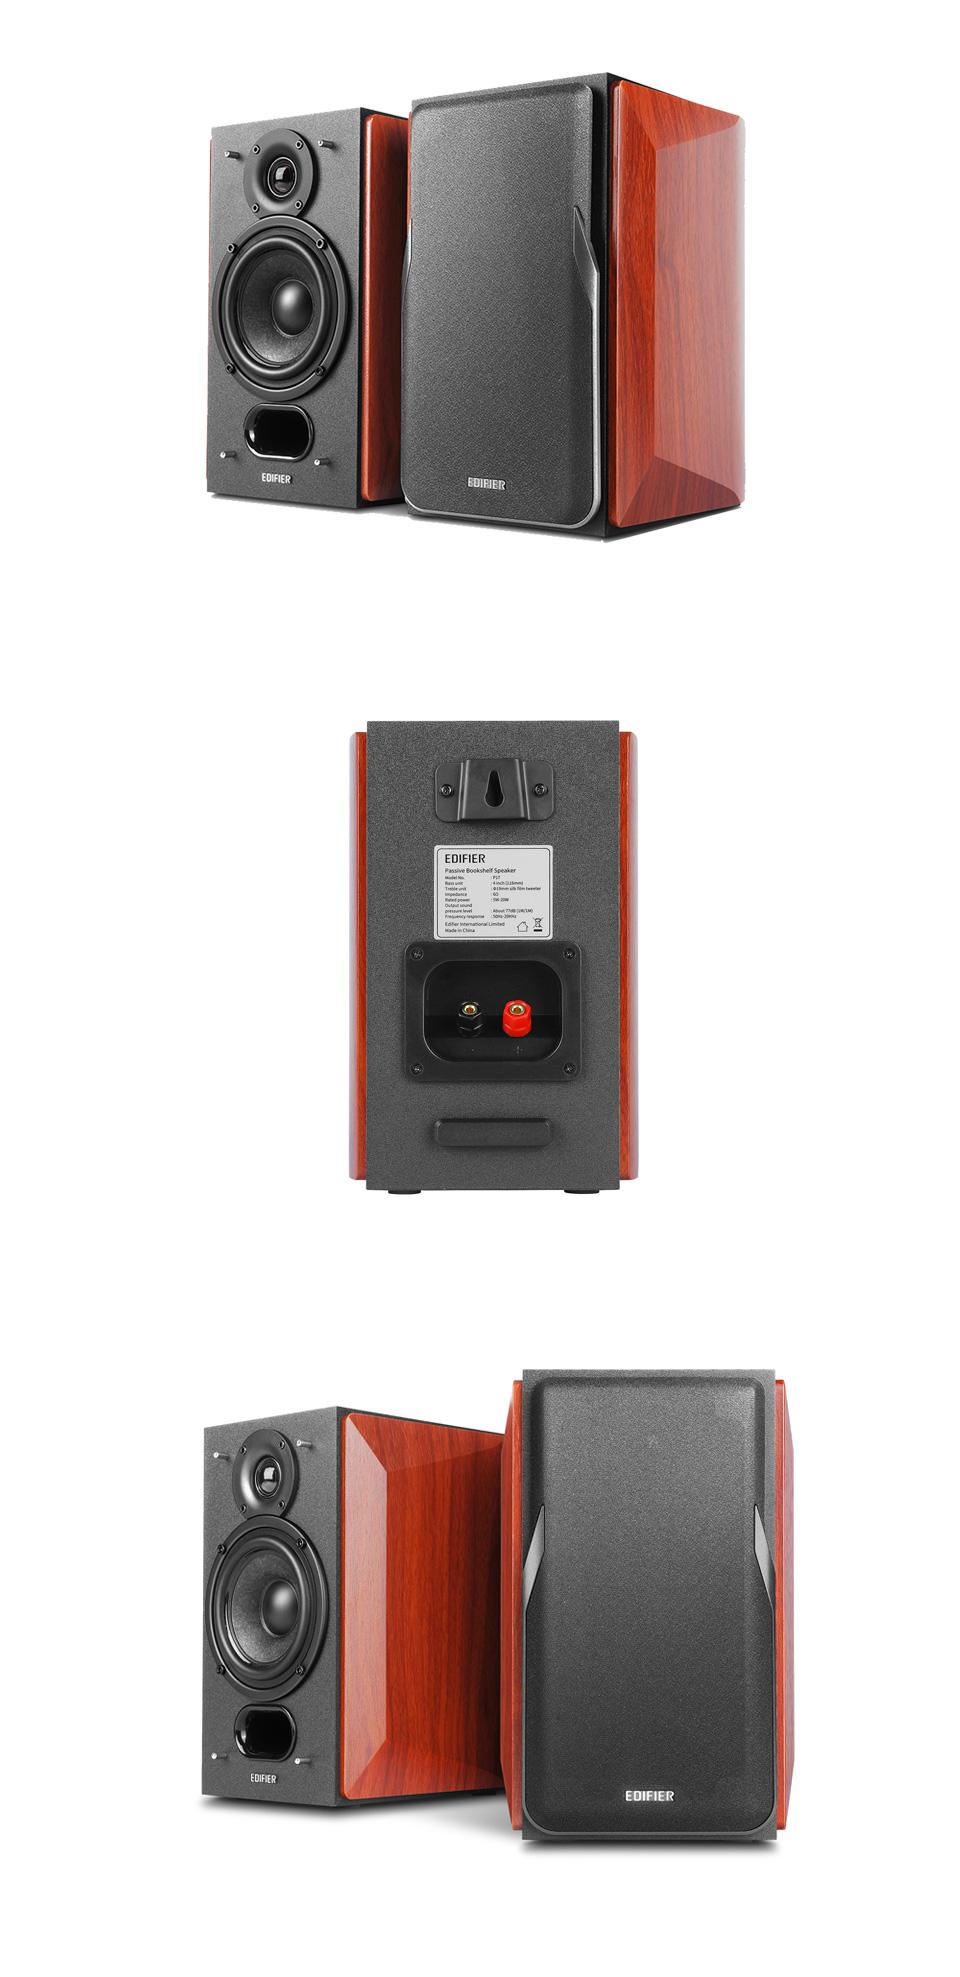 Edifier P17 Premium Wooden Passive Bookshelf Speakers product